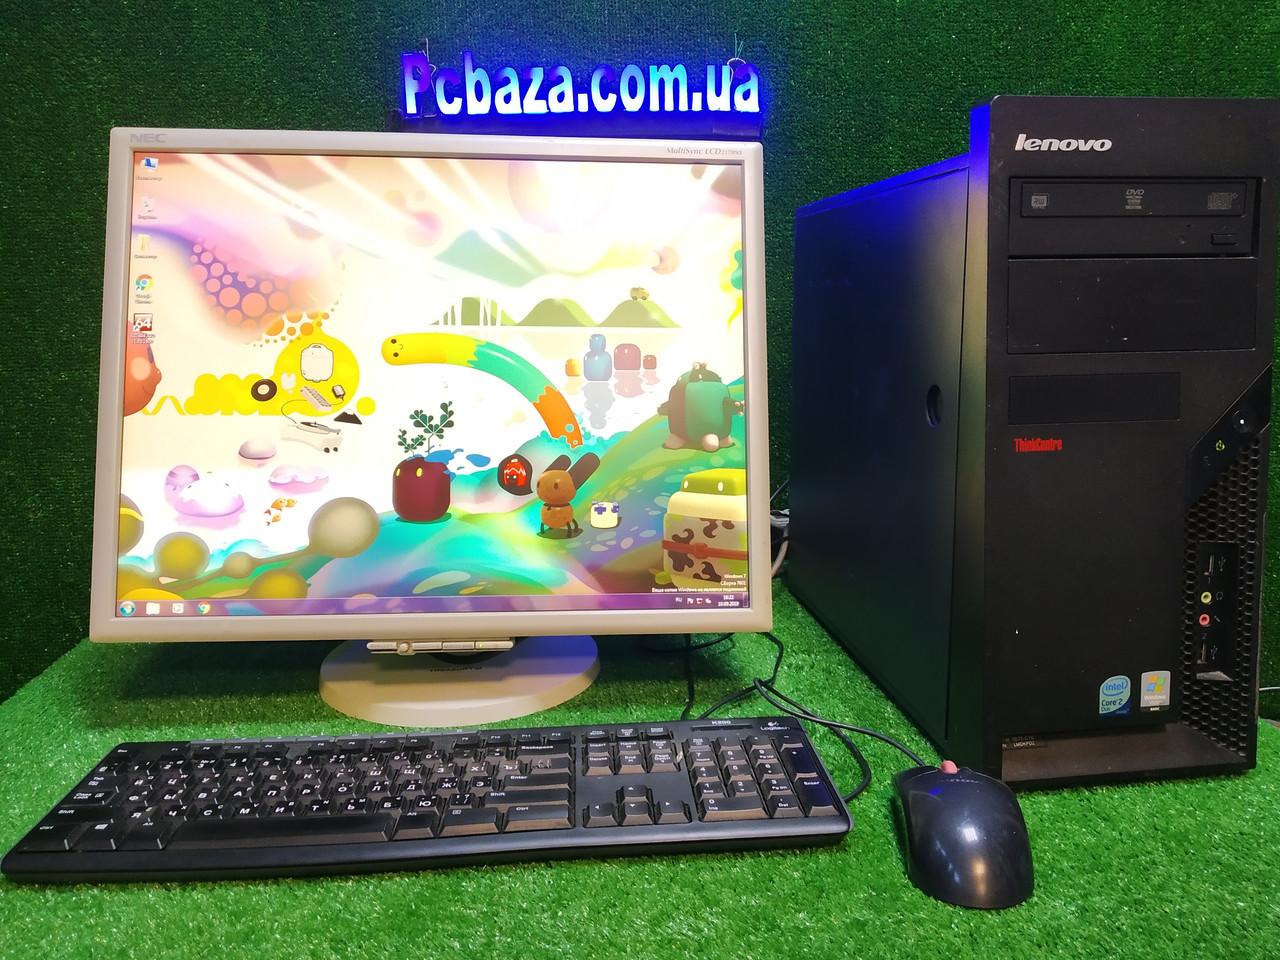 "Компьютер Lenovo \ Intel 4 ядра, 4 ГБ ОЗУ, 320 Гб+ PVA Монитор NEC 22"" ( клавиатура и мышка в подарок)"